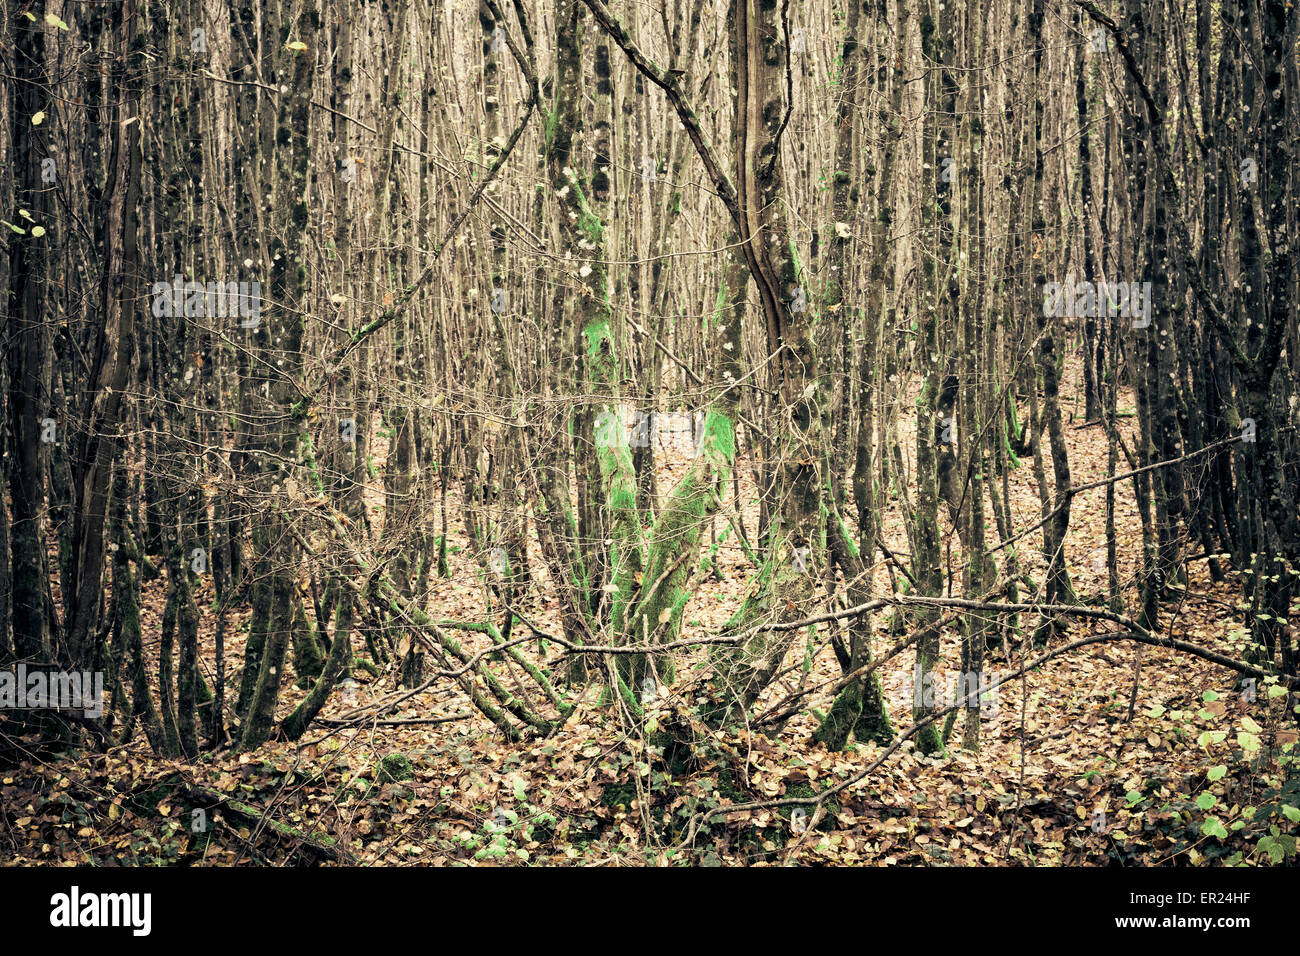 Arbre arbres forêt bois Photo Stock